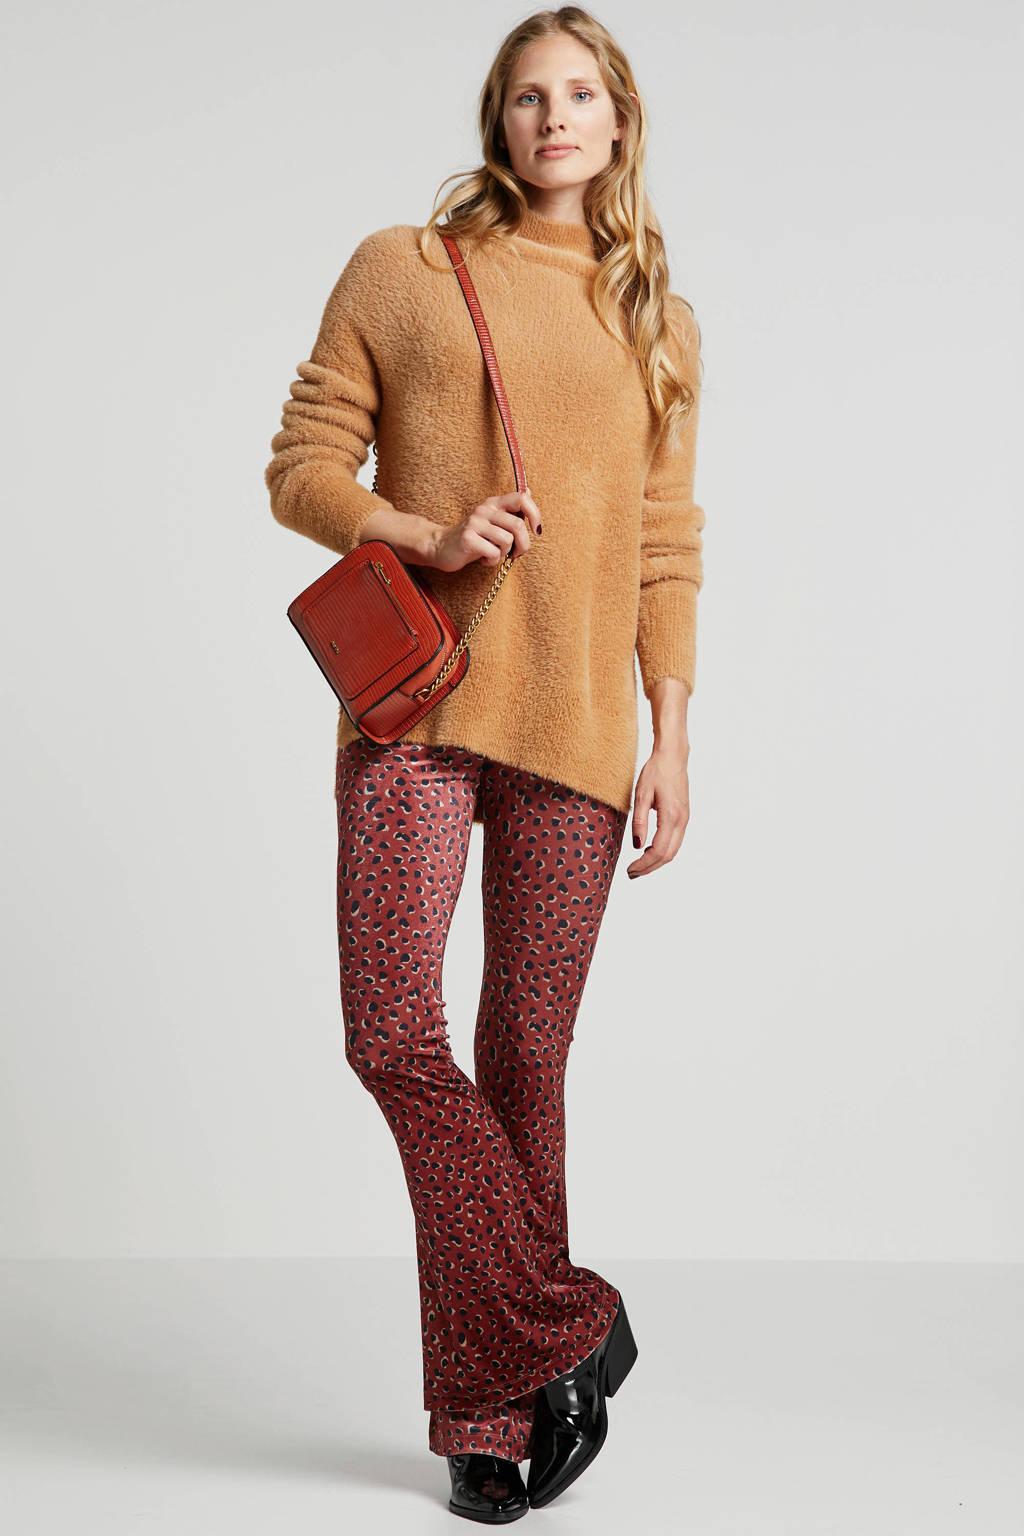 Catwalk Junkie flared broek met panterprint rood/zwart, Rood/zwart